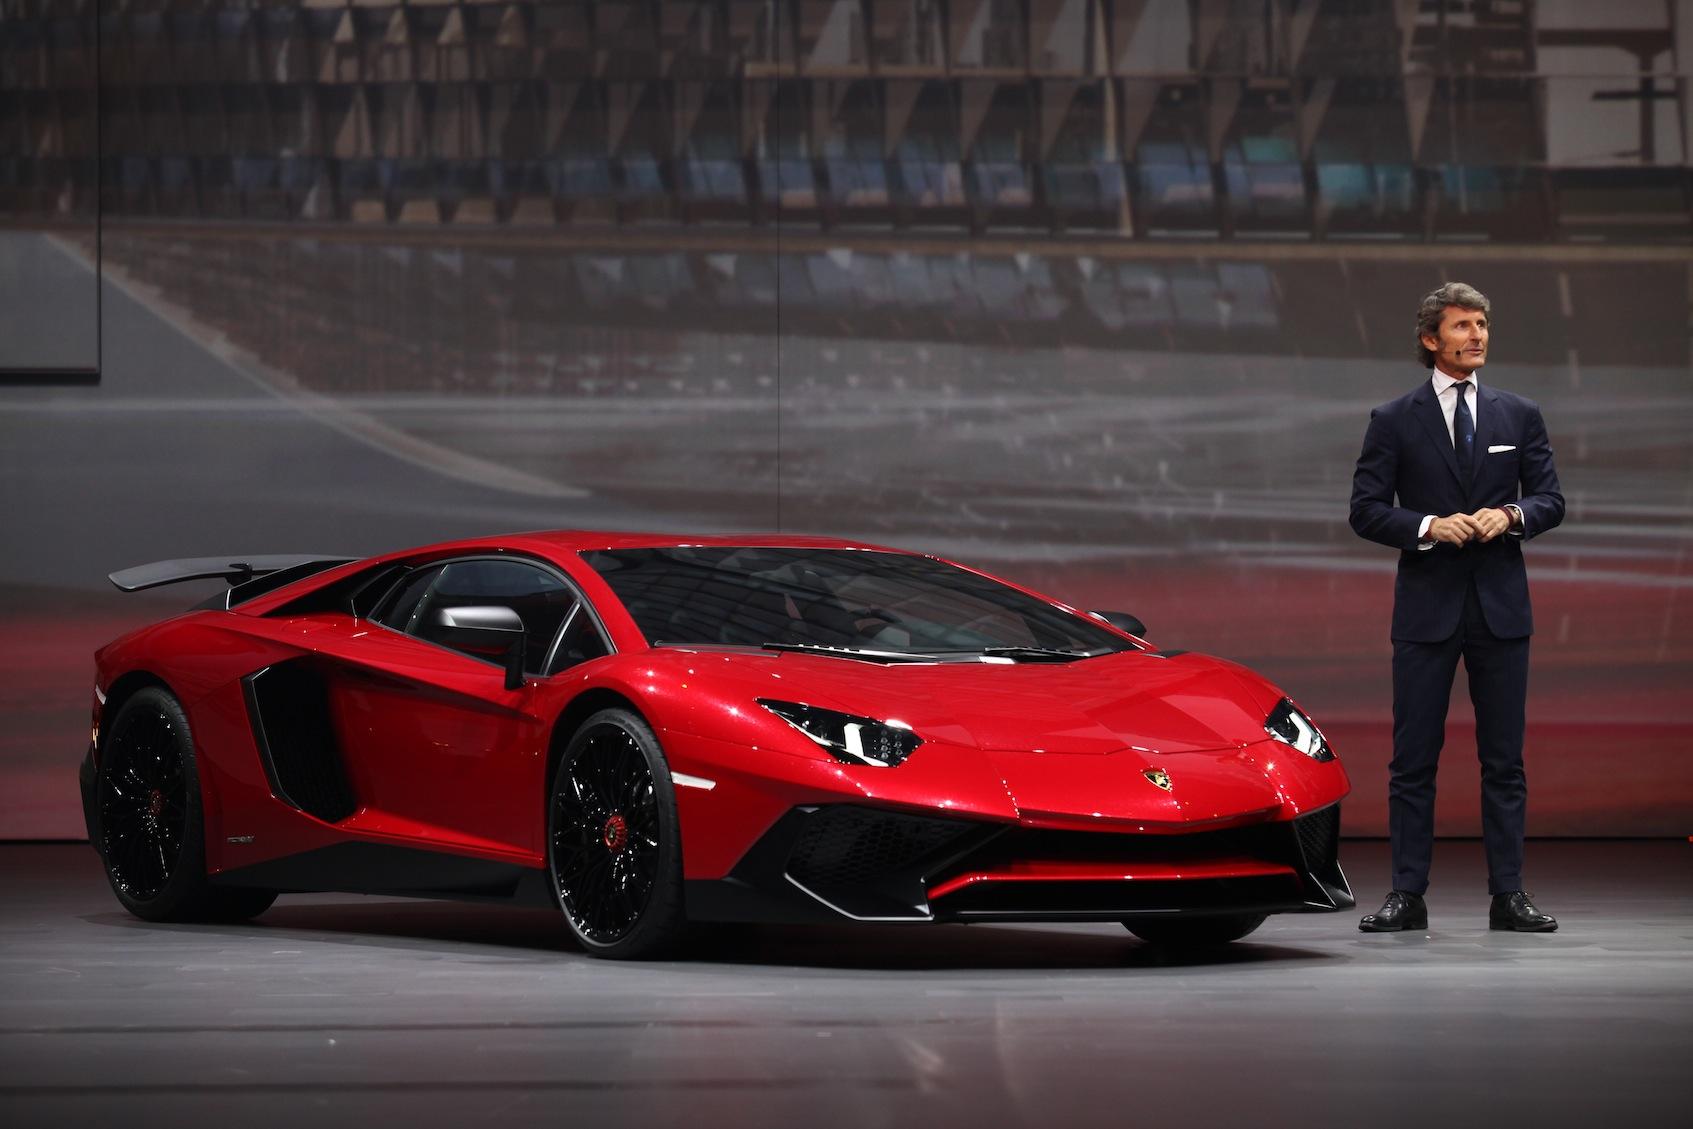 lamborghini-presents-the-new-aventador-lp-750-4-superveloce-at-auto-shanghai-2015-378406